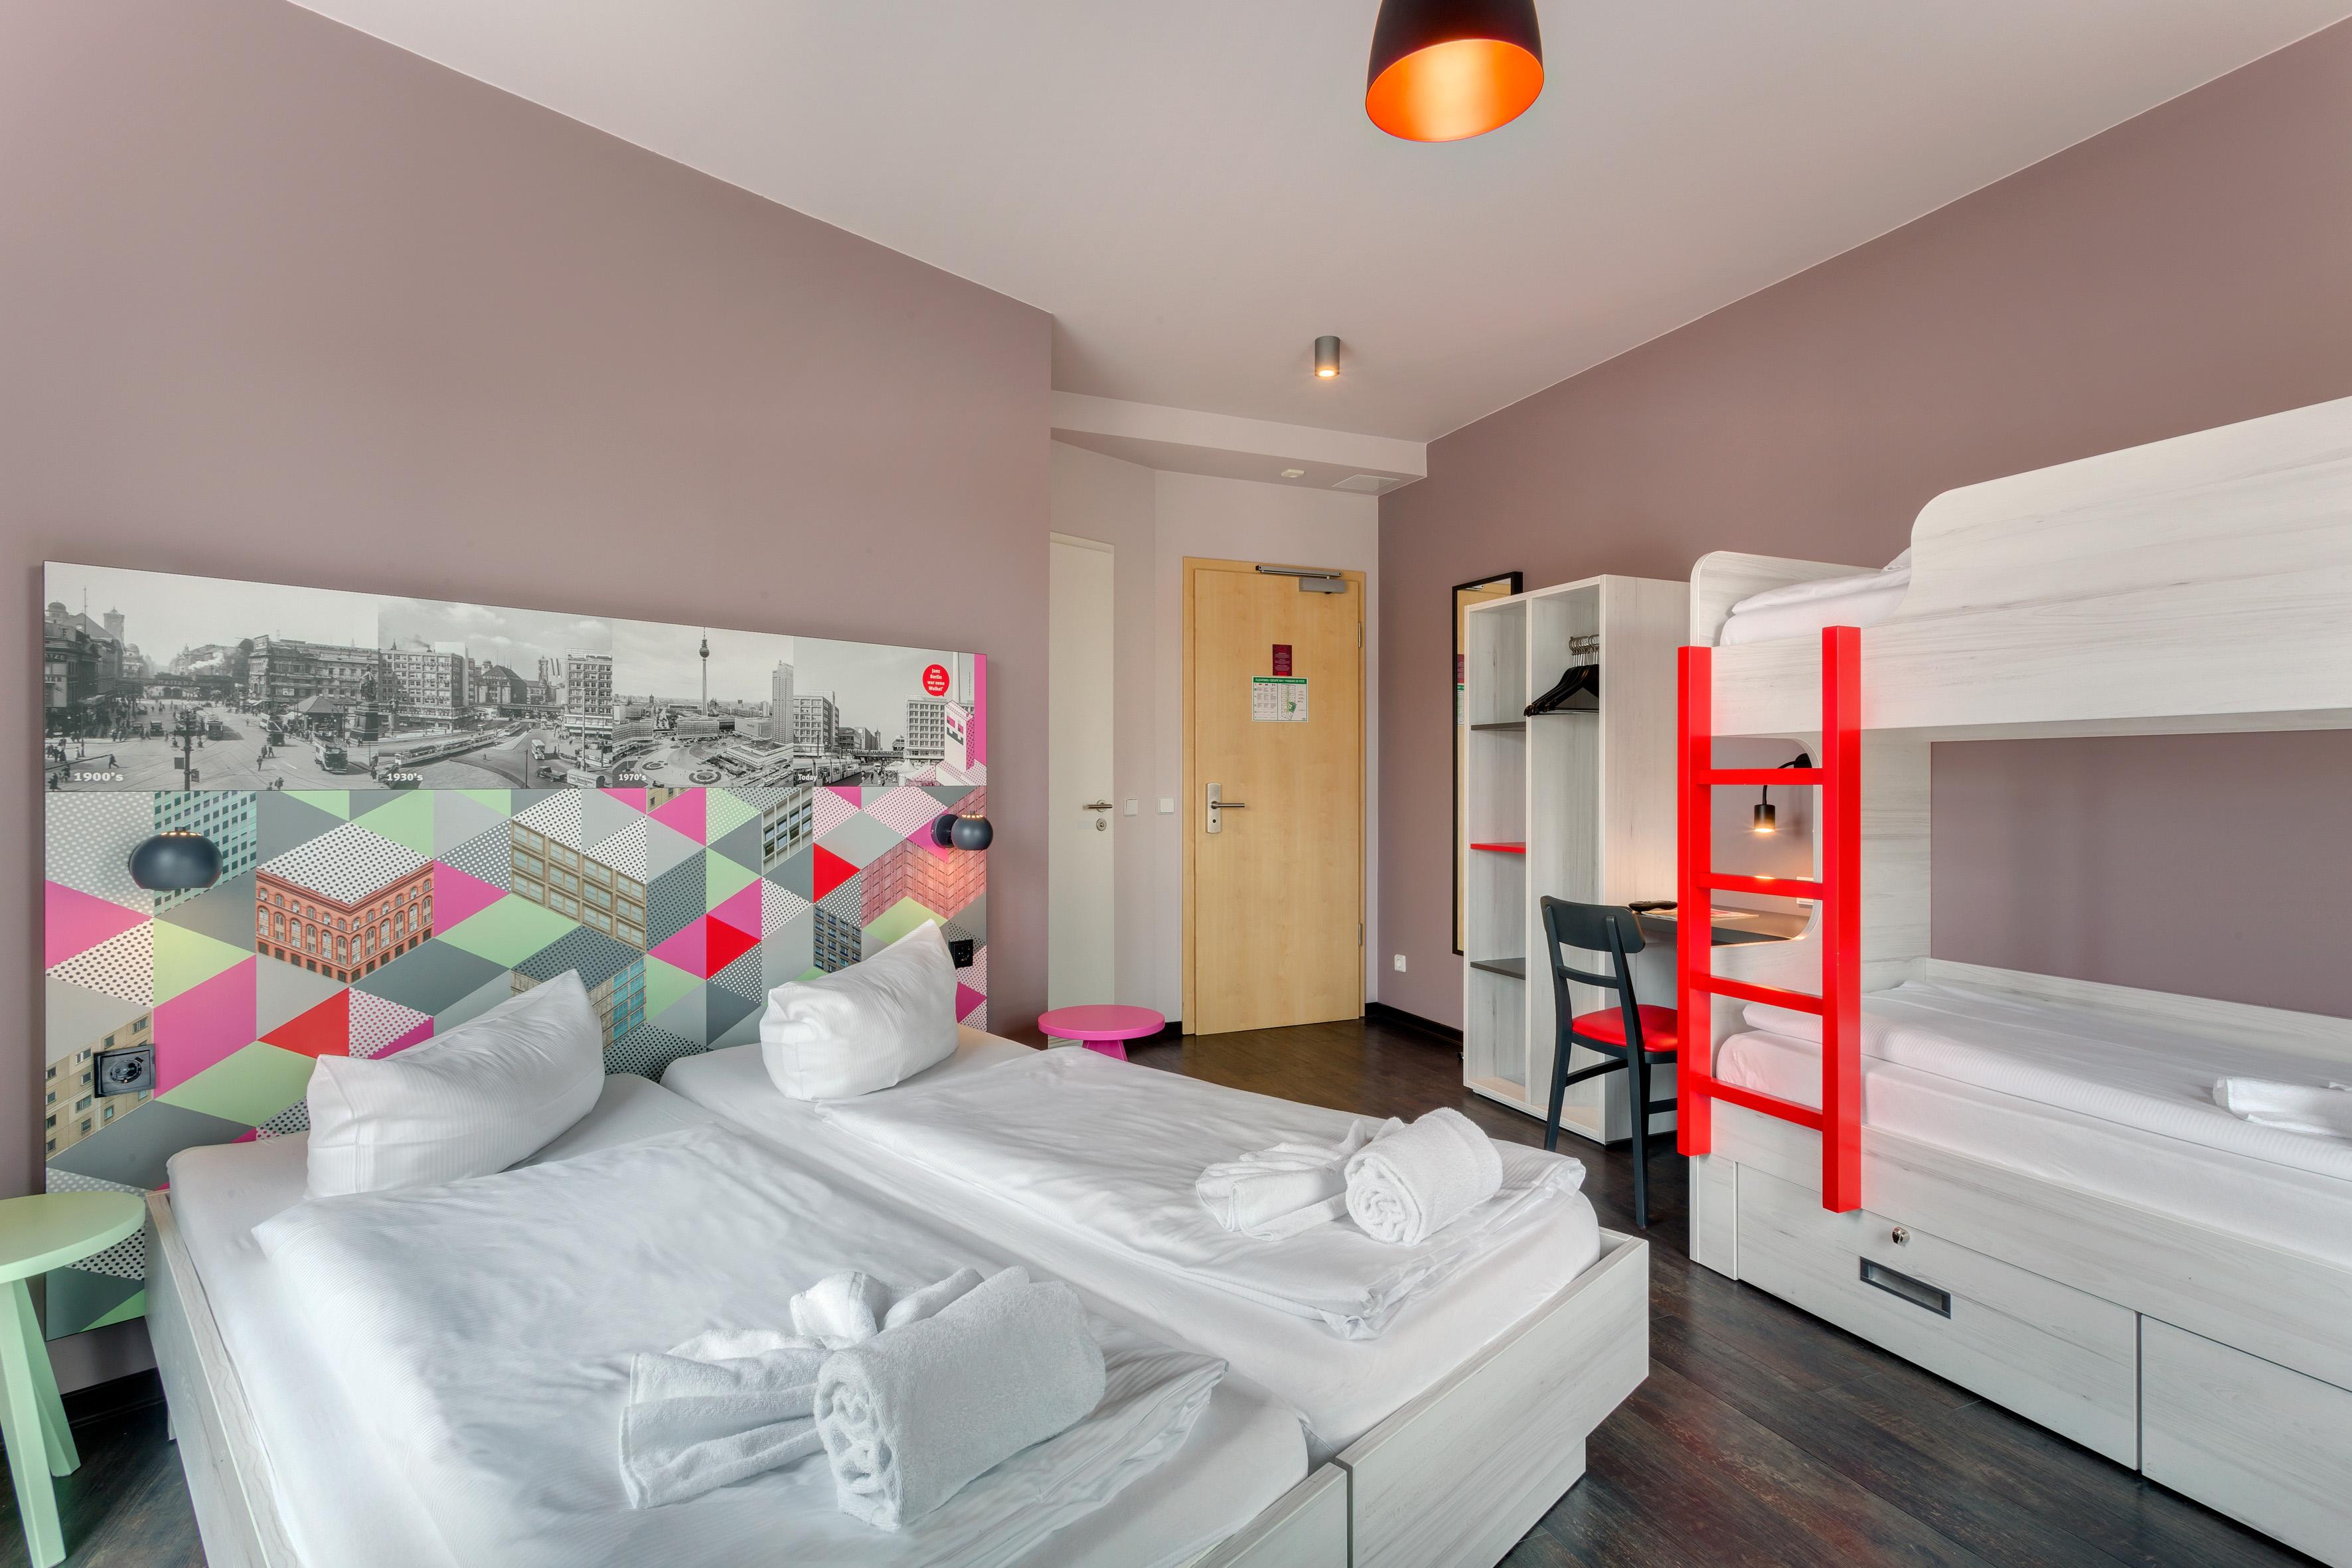 MEININGER Hotel Berlin Alexanderplatz - Family Room